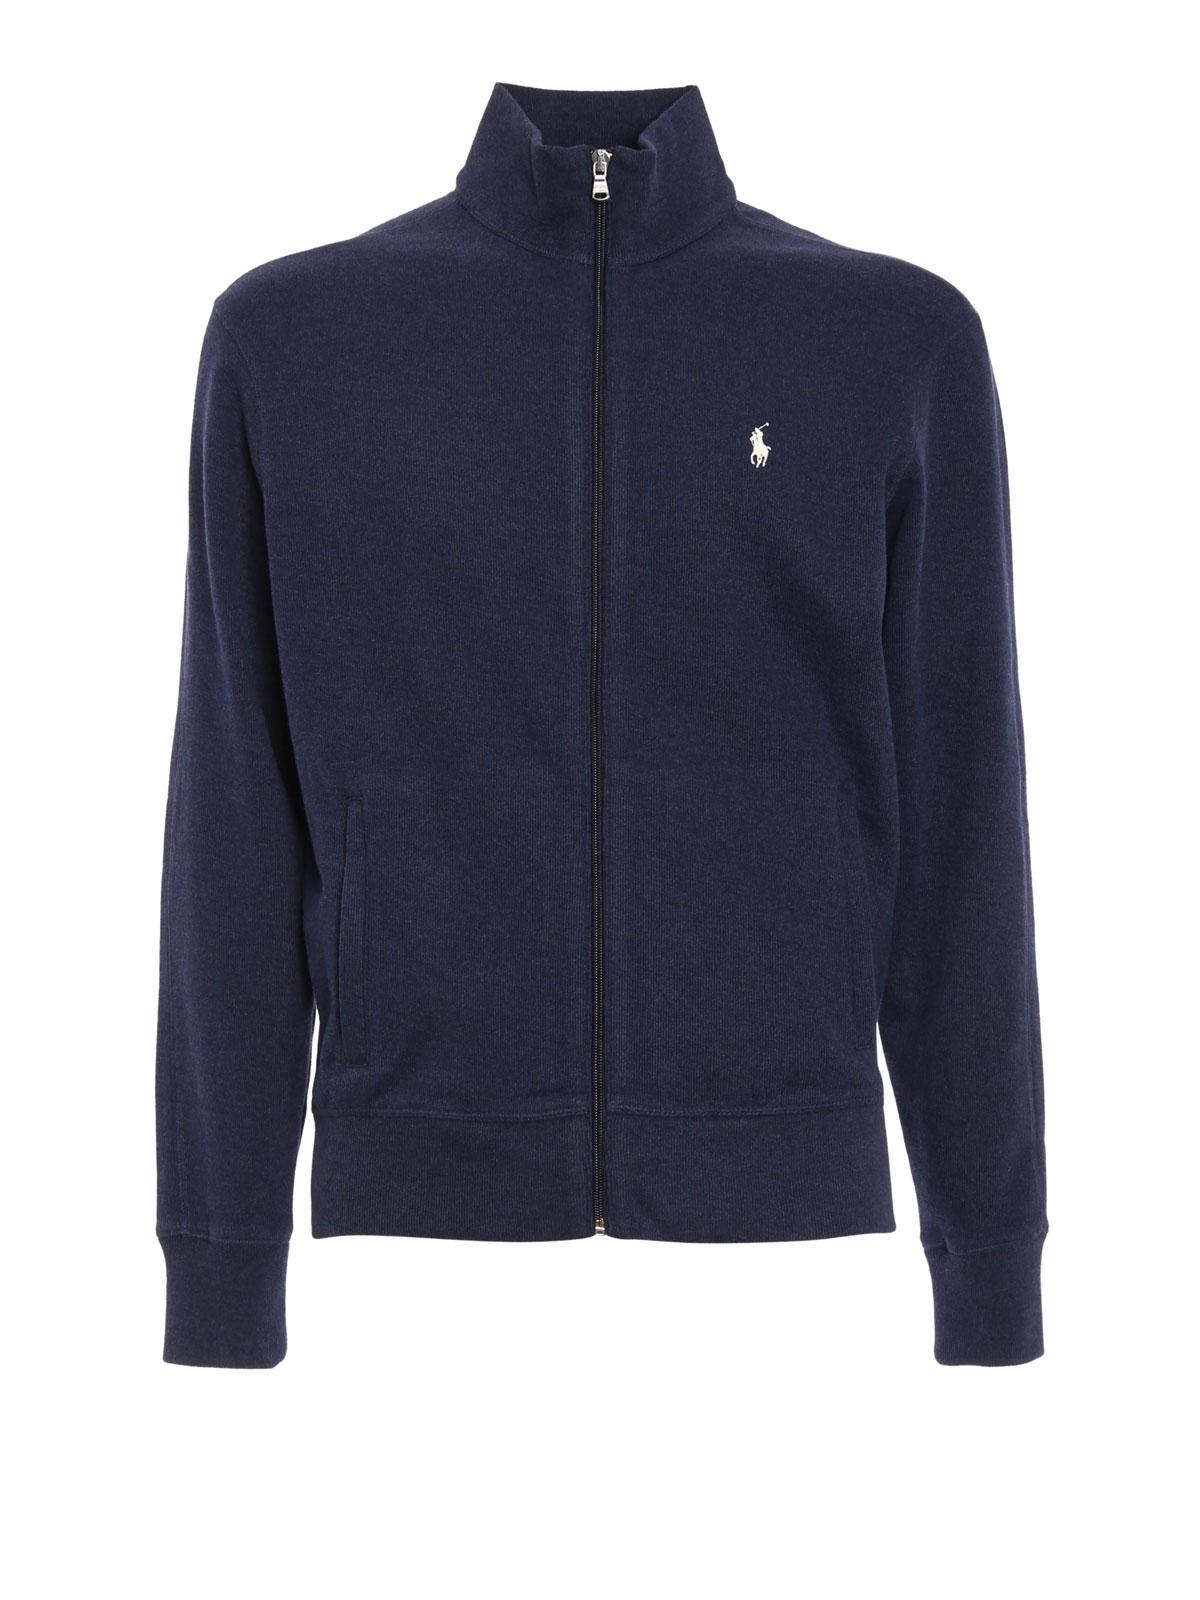 Cotton Ralph Fleece Polo Sweatshirtsamp; Jacket Pulls Lauren R35qScL4Aj